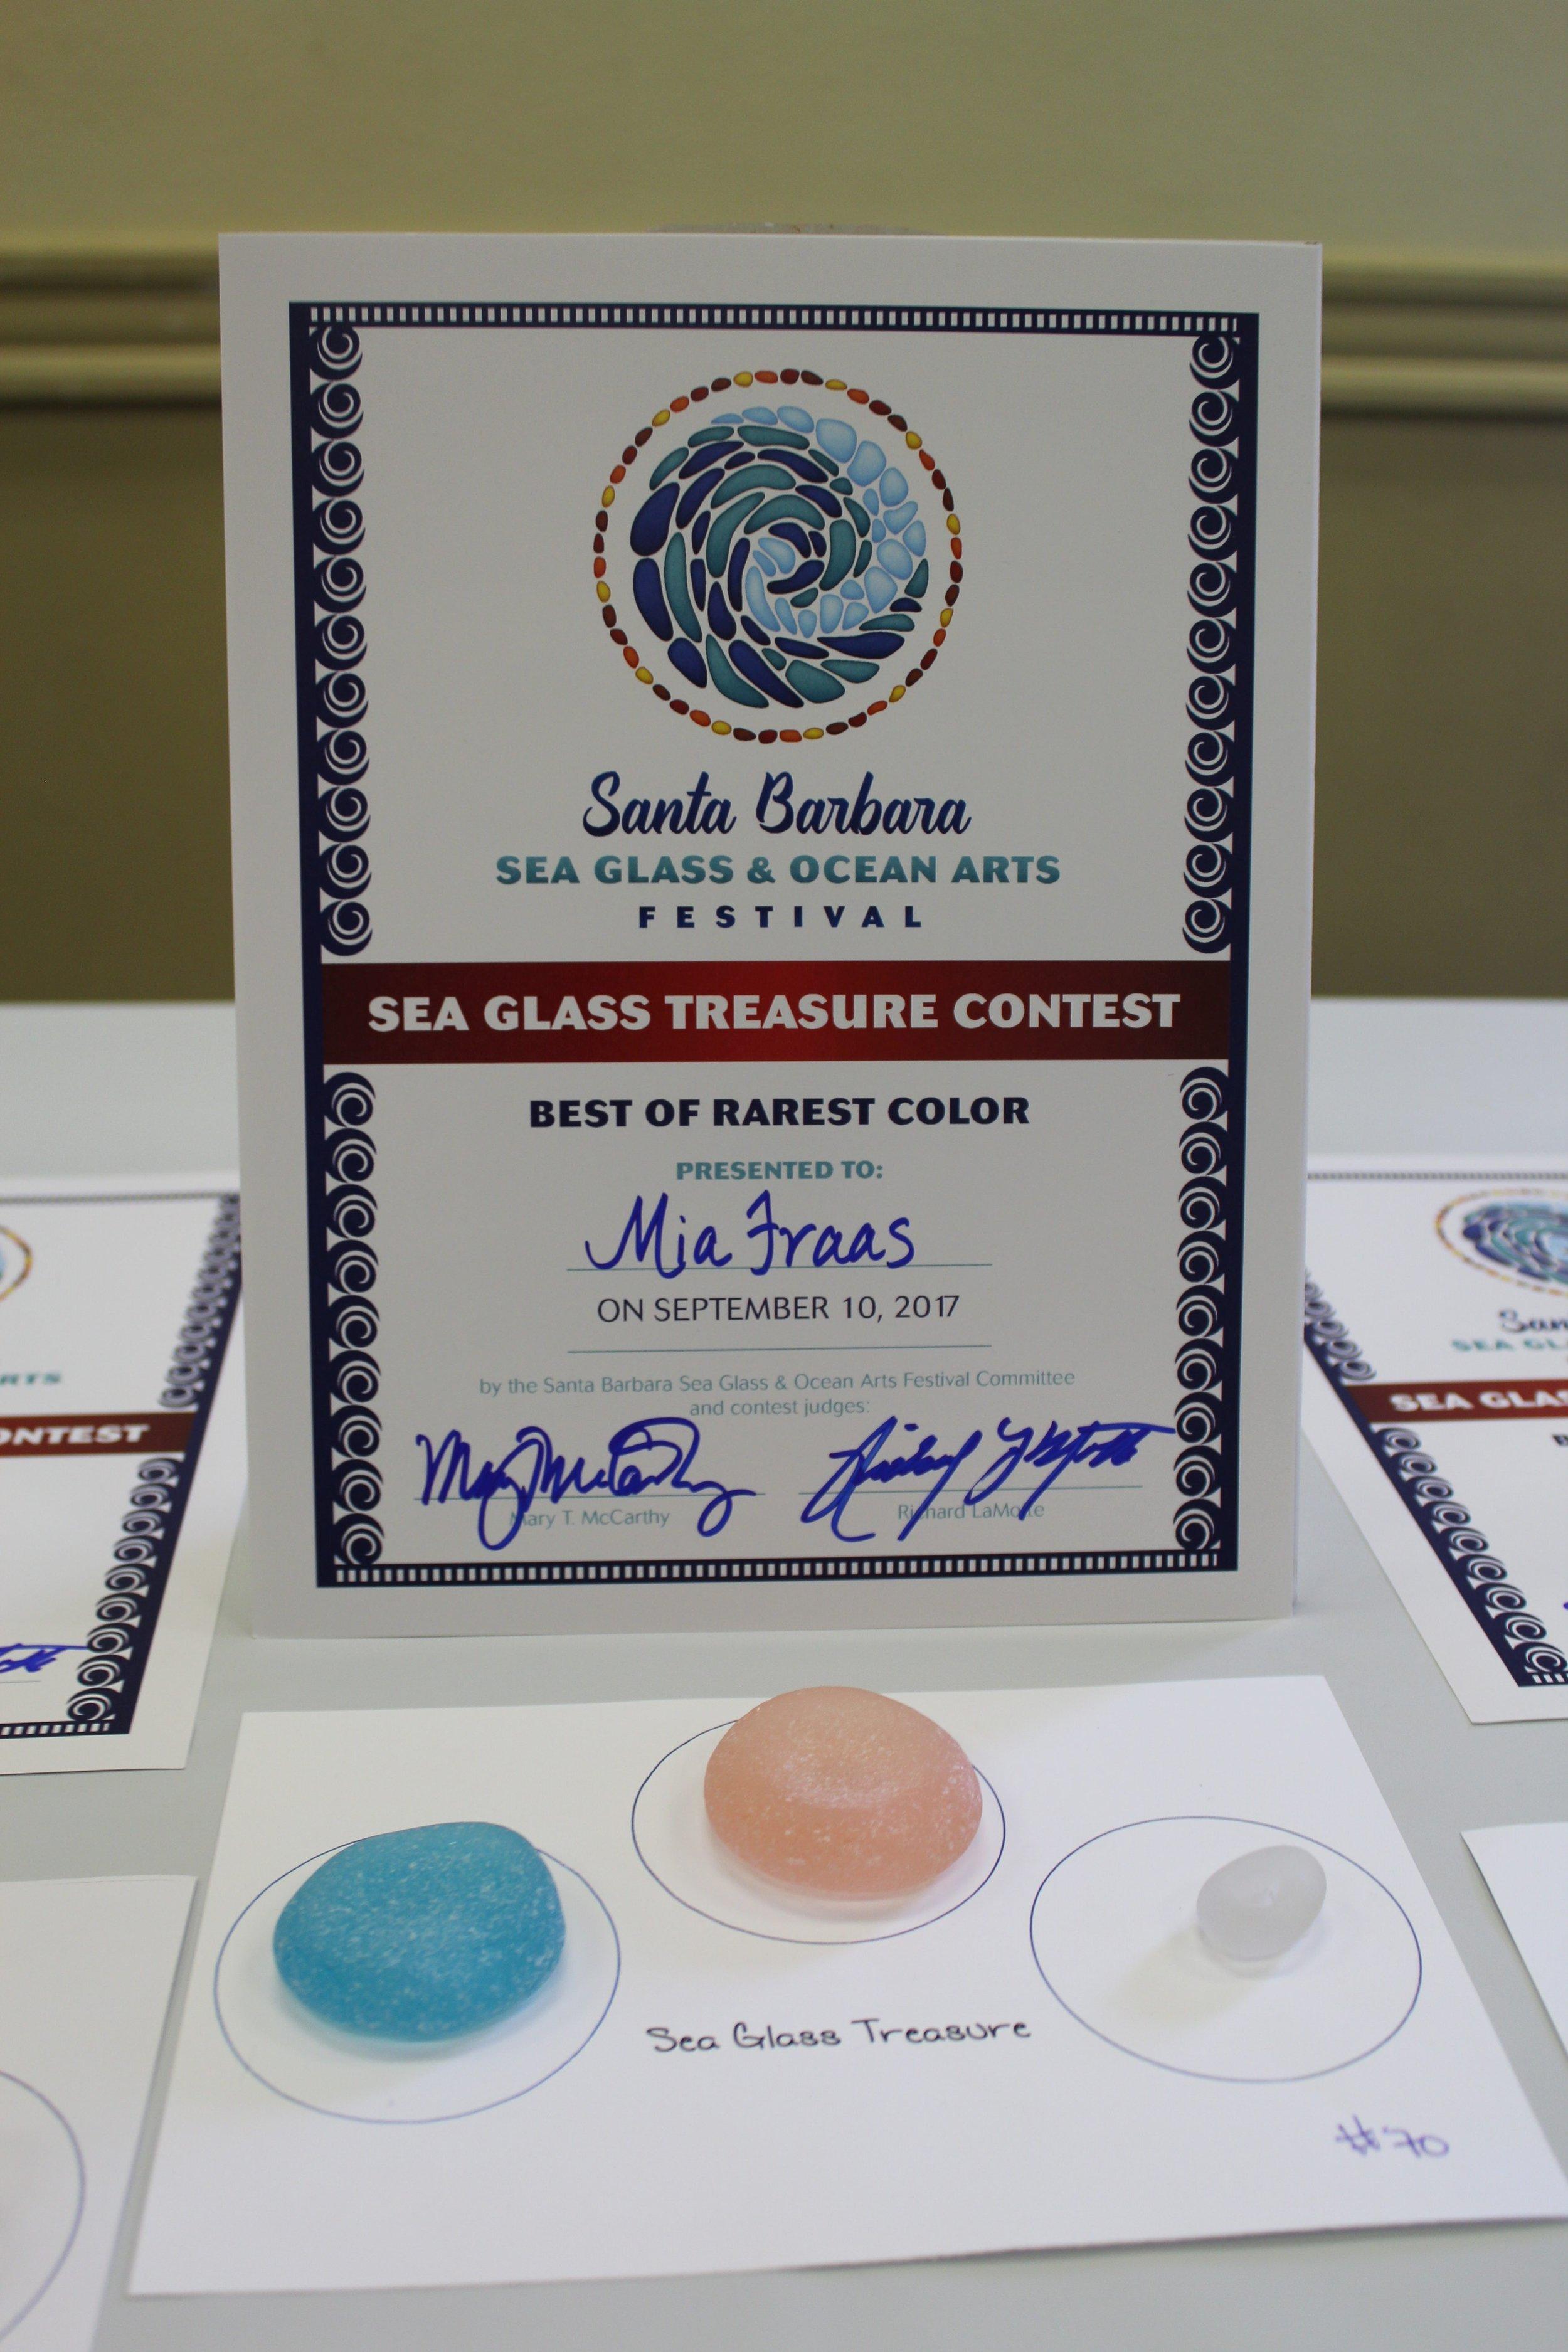 Best of Rarest Color: Mia Fraas